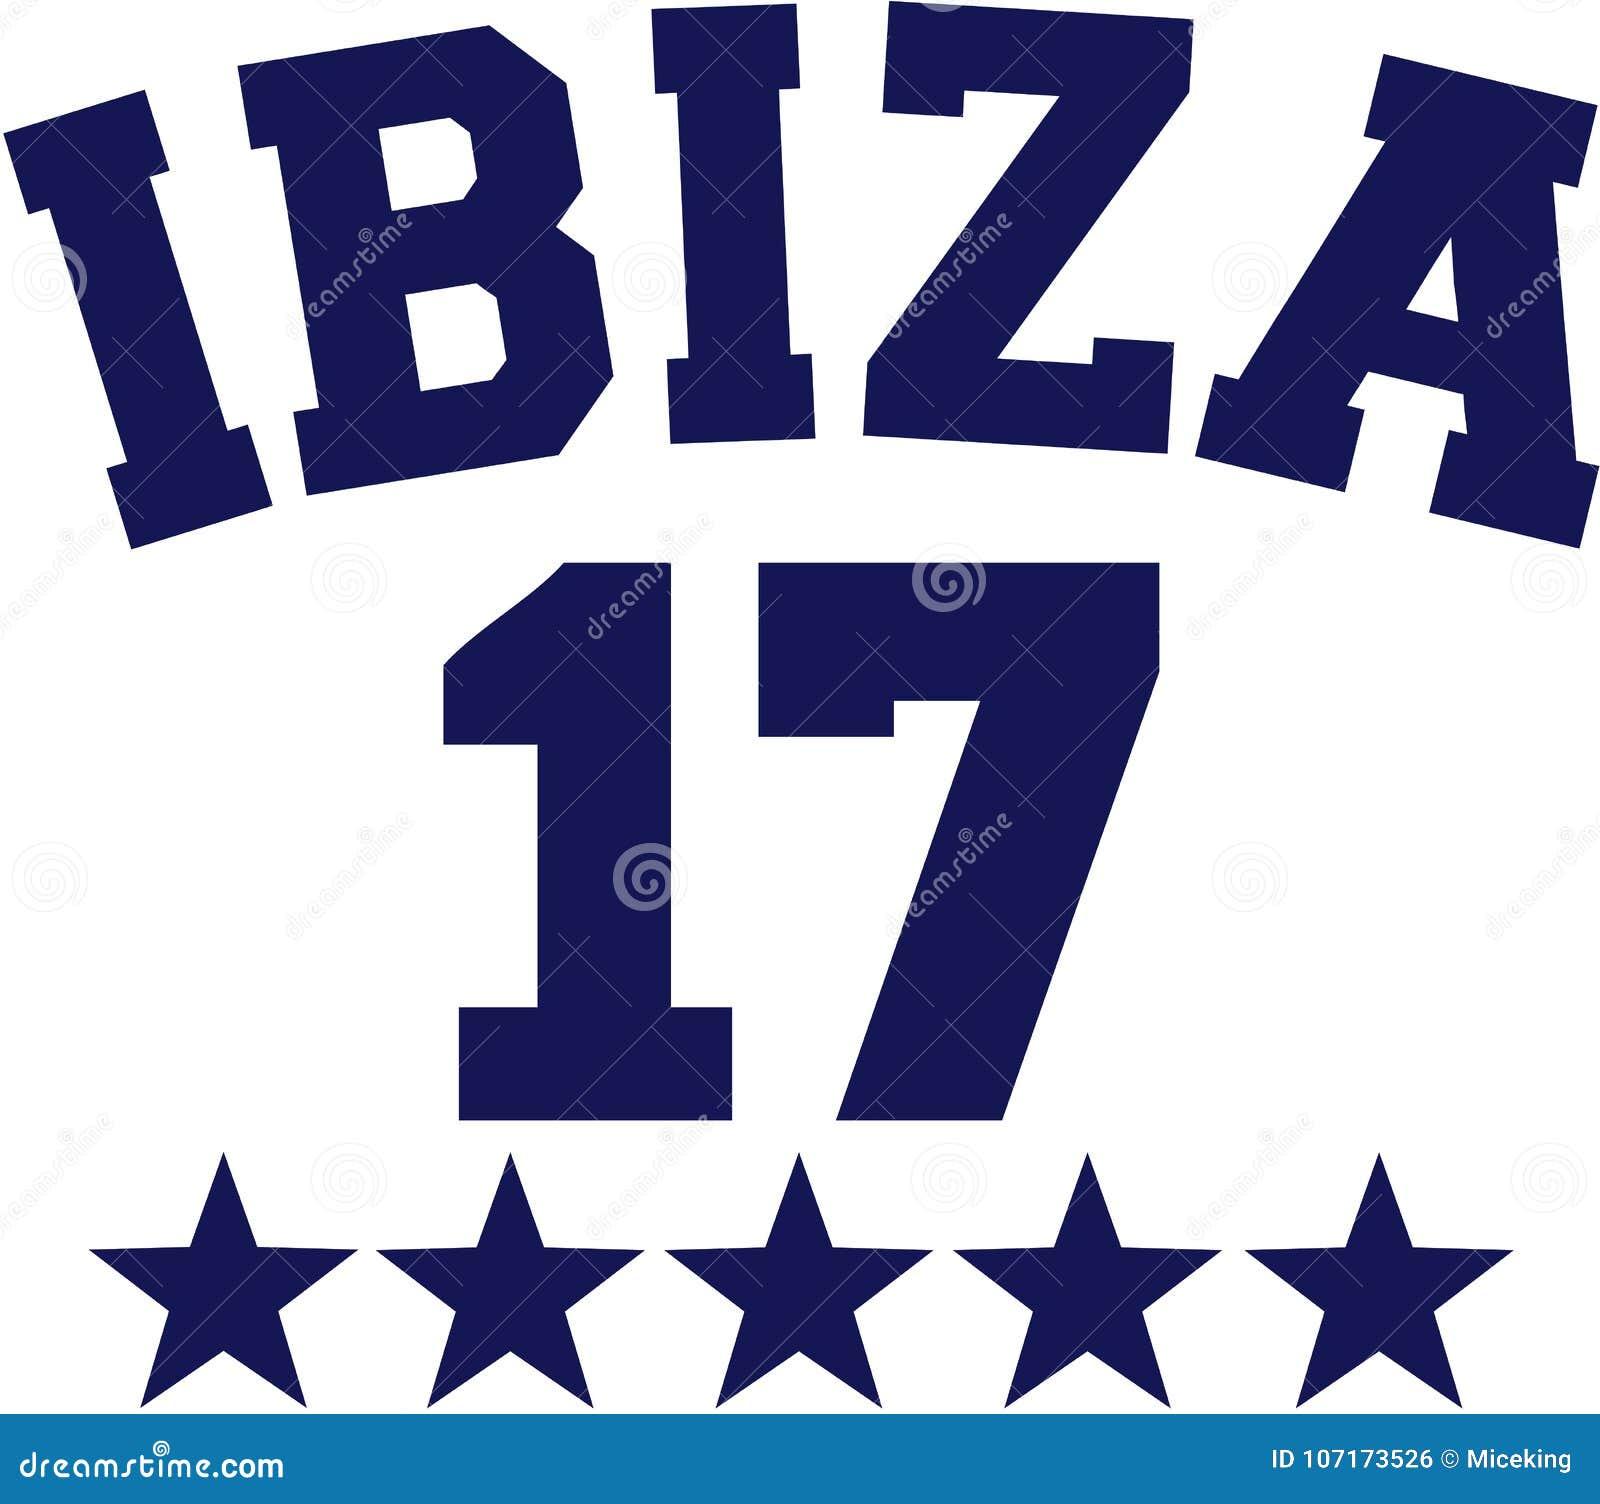 Ibiza 17 vektor